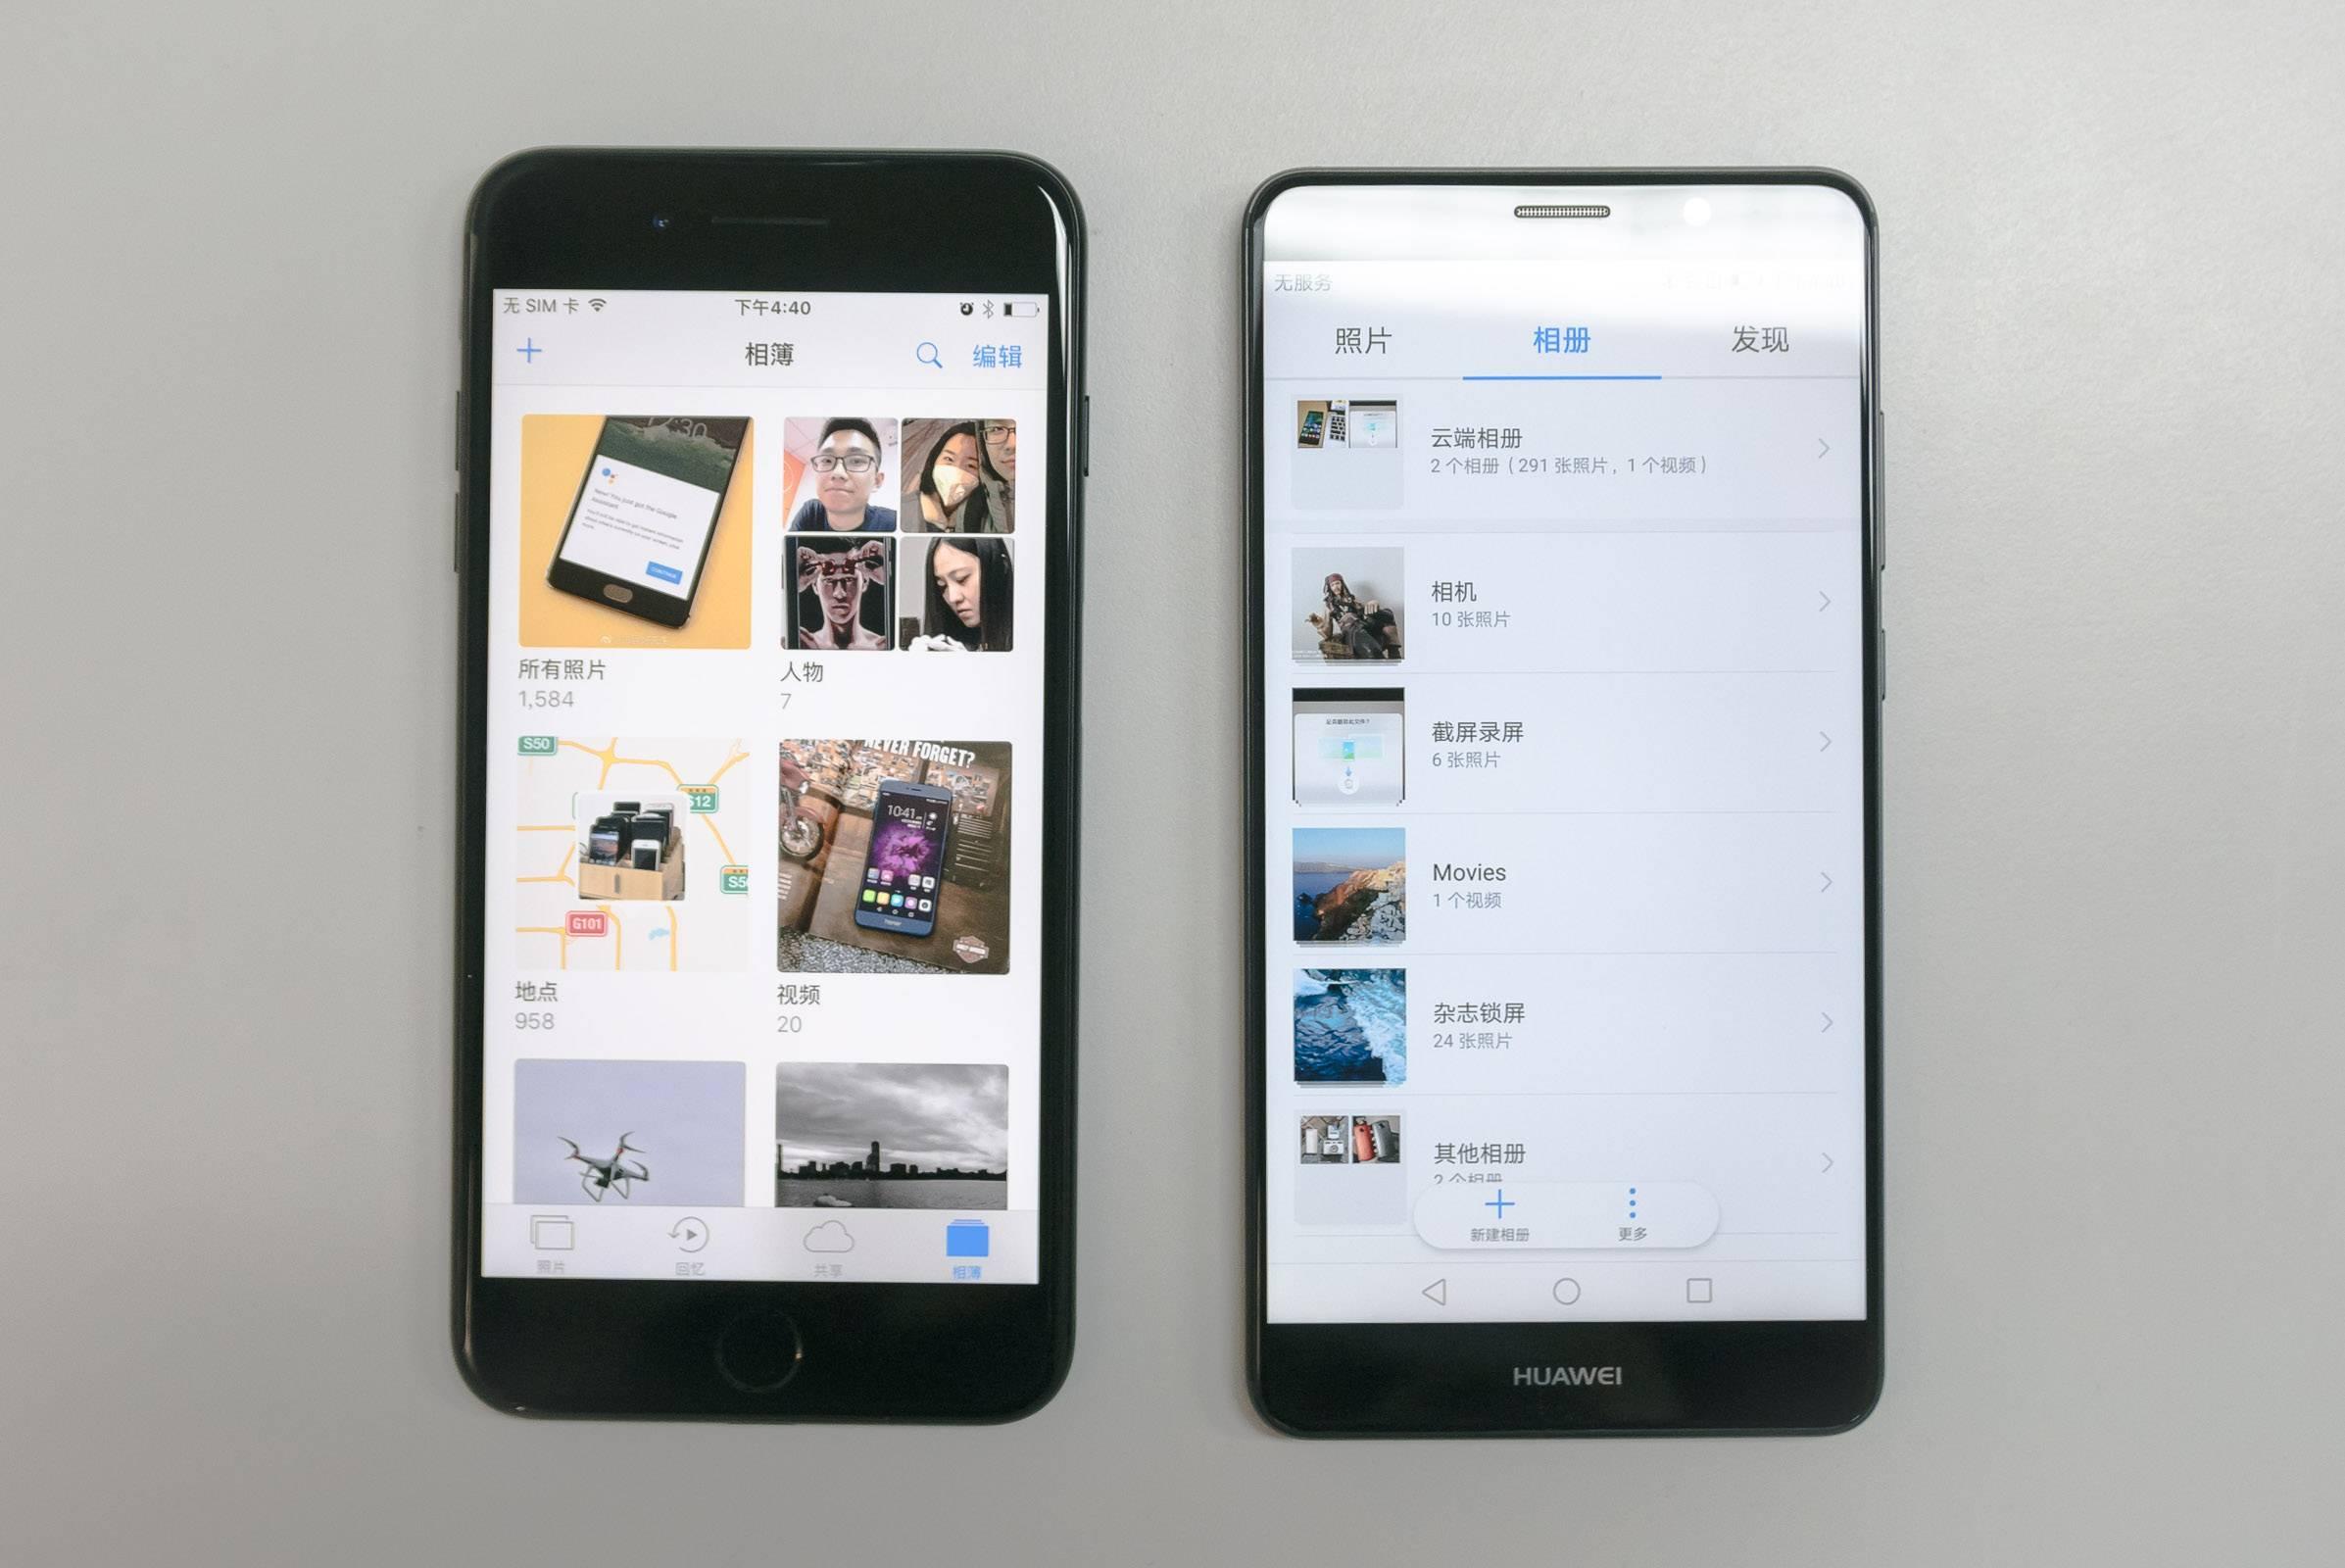 iPhone 7 Plus 和 Mate 9 图库默认页面对比